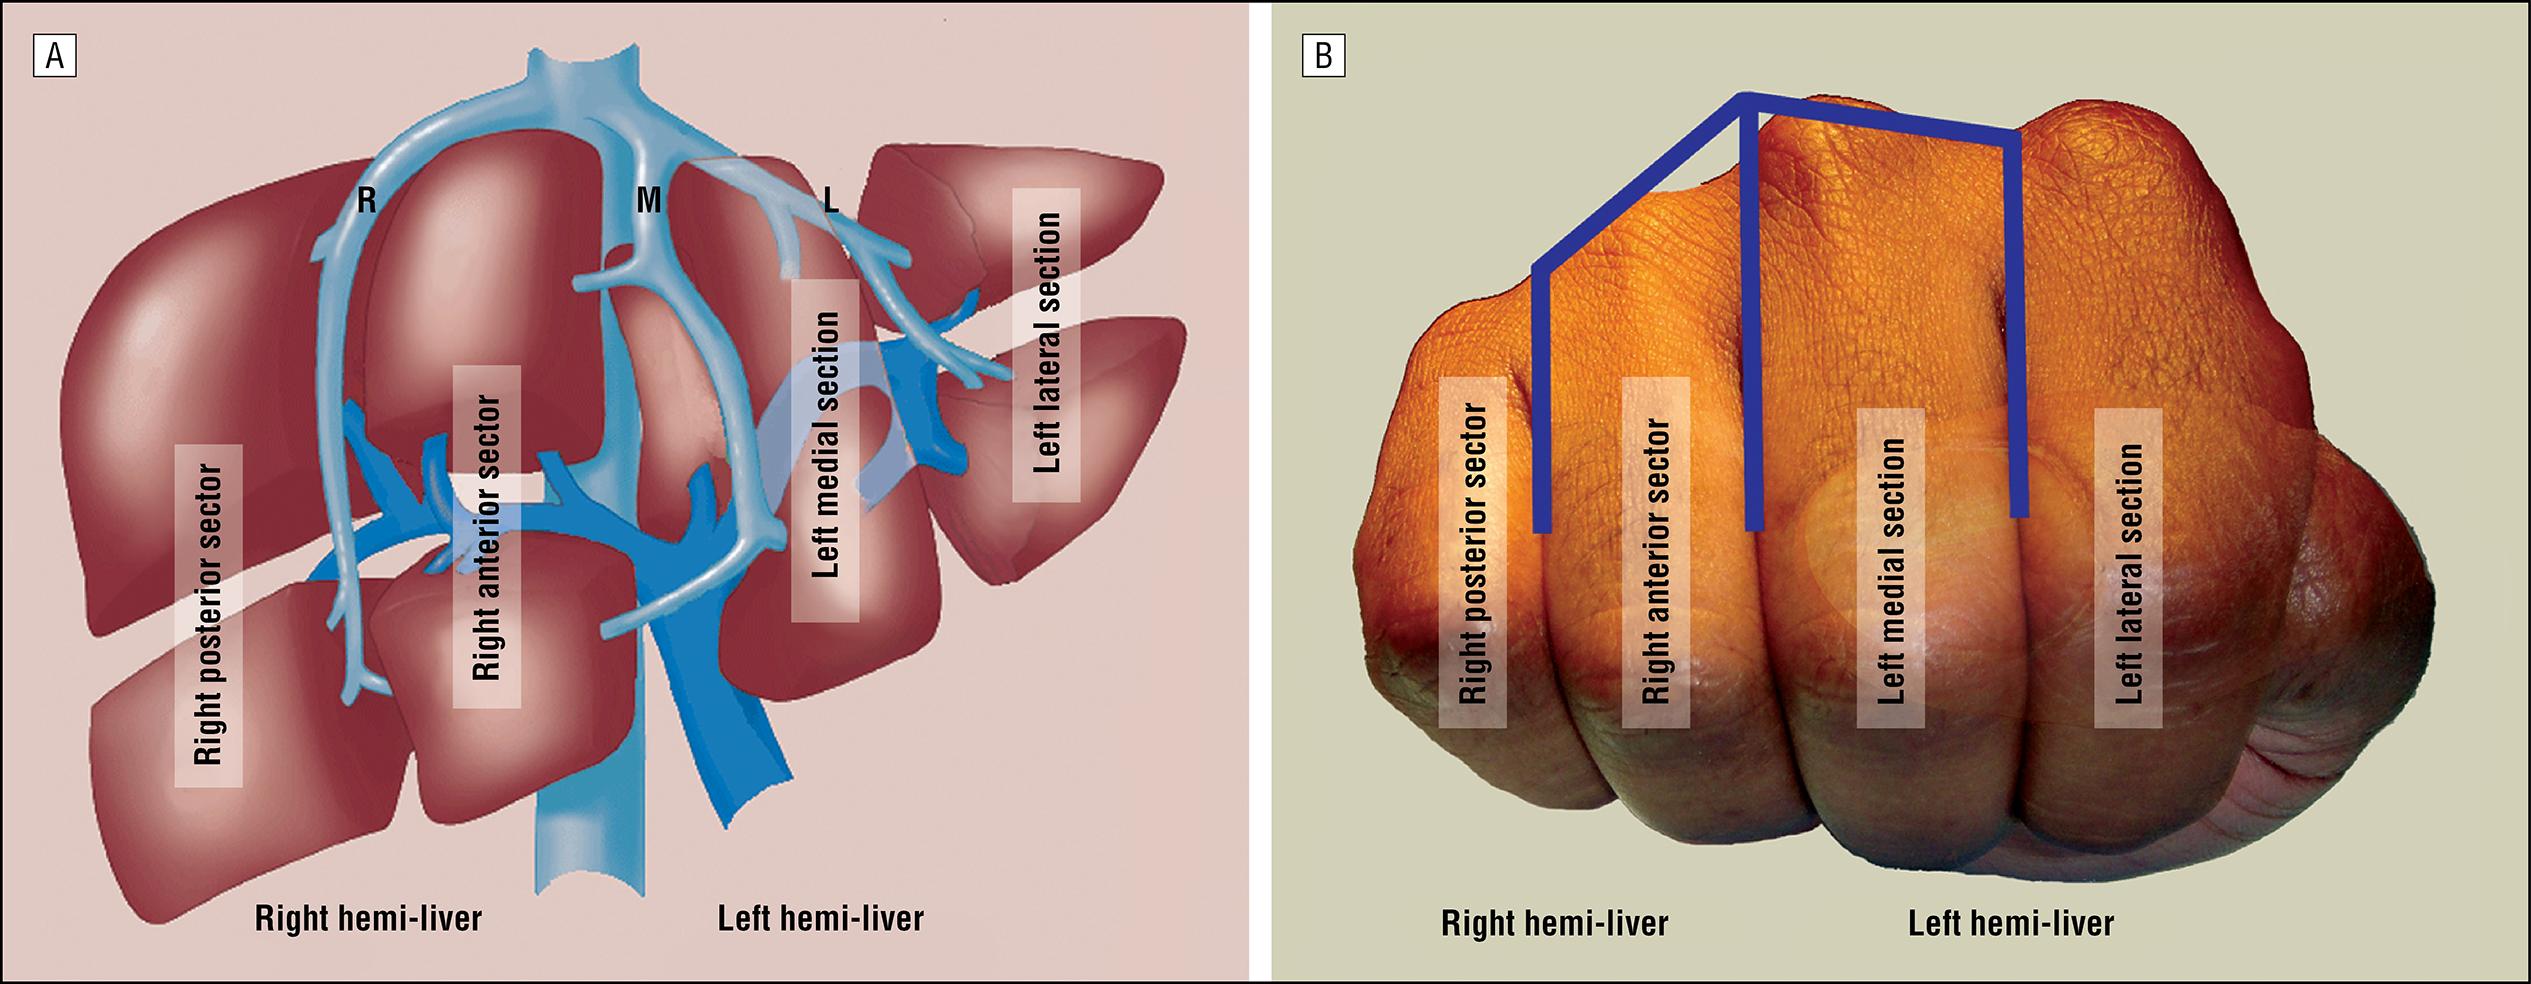 A Handy Tool To Teach Segmental Liver Anatomy To Surgical Trainees